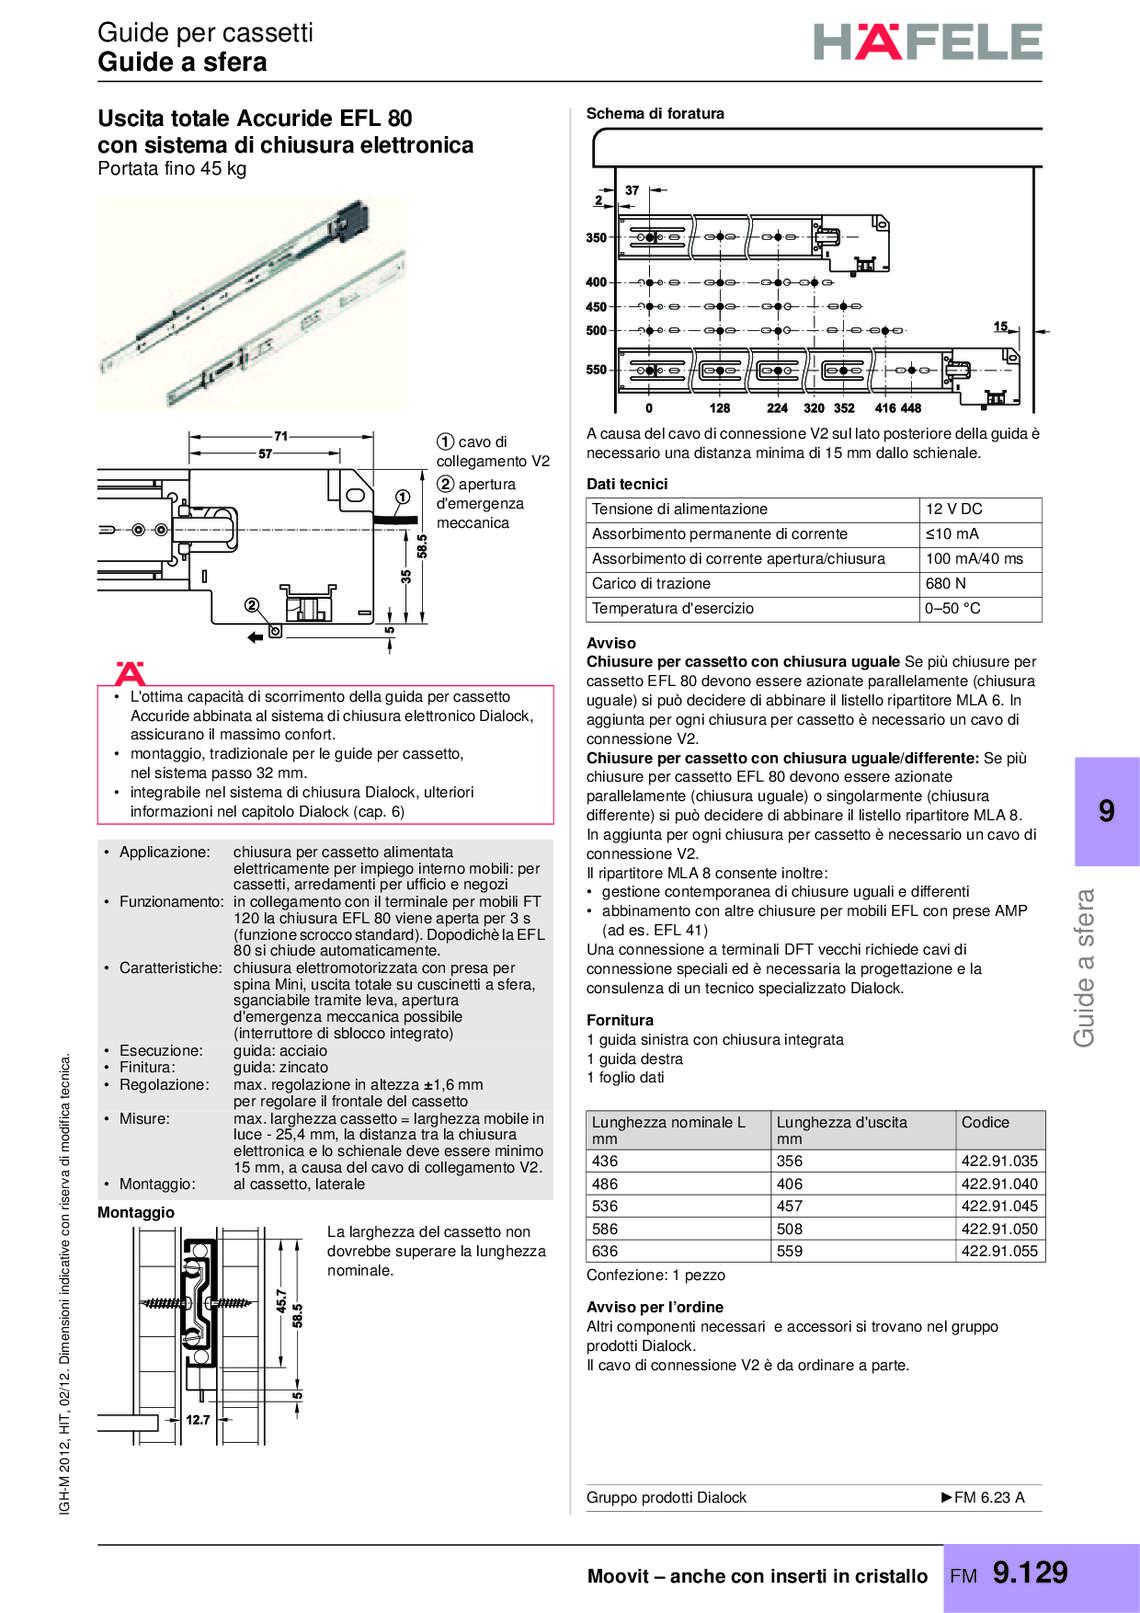 hafele-spondine-e-guide-per-mobili_40_182.jpg